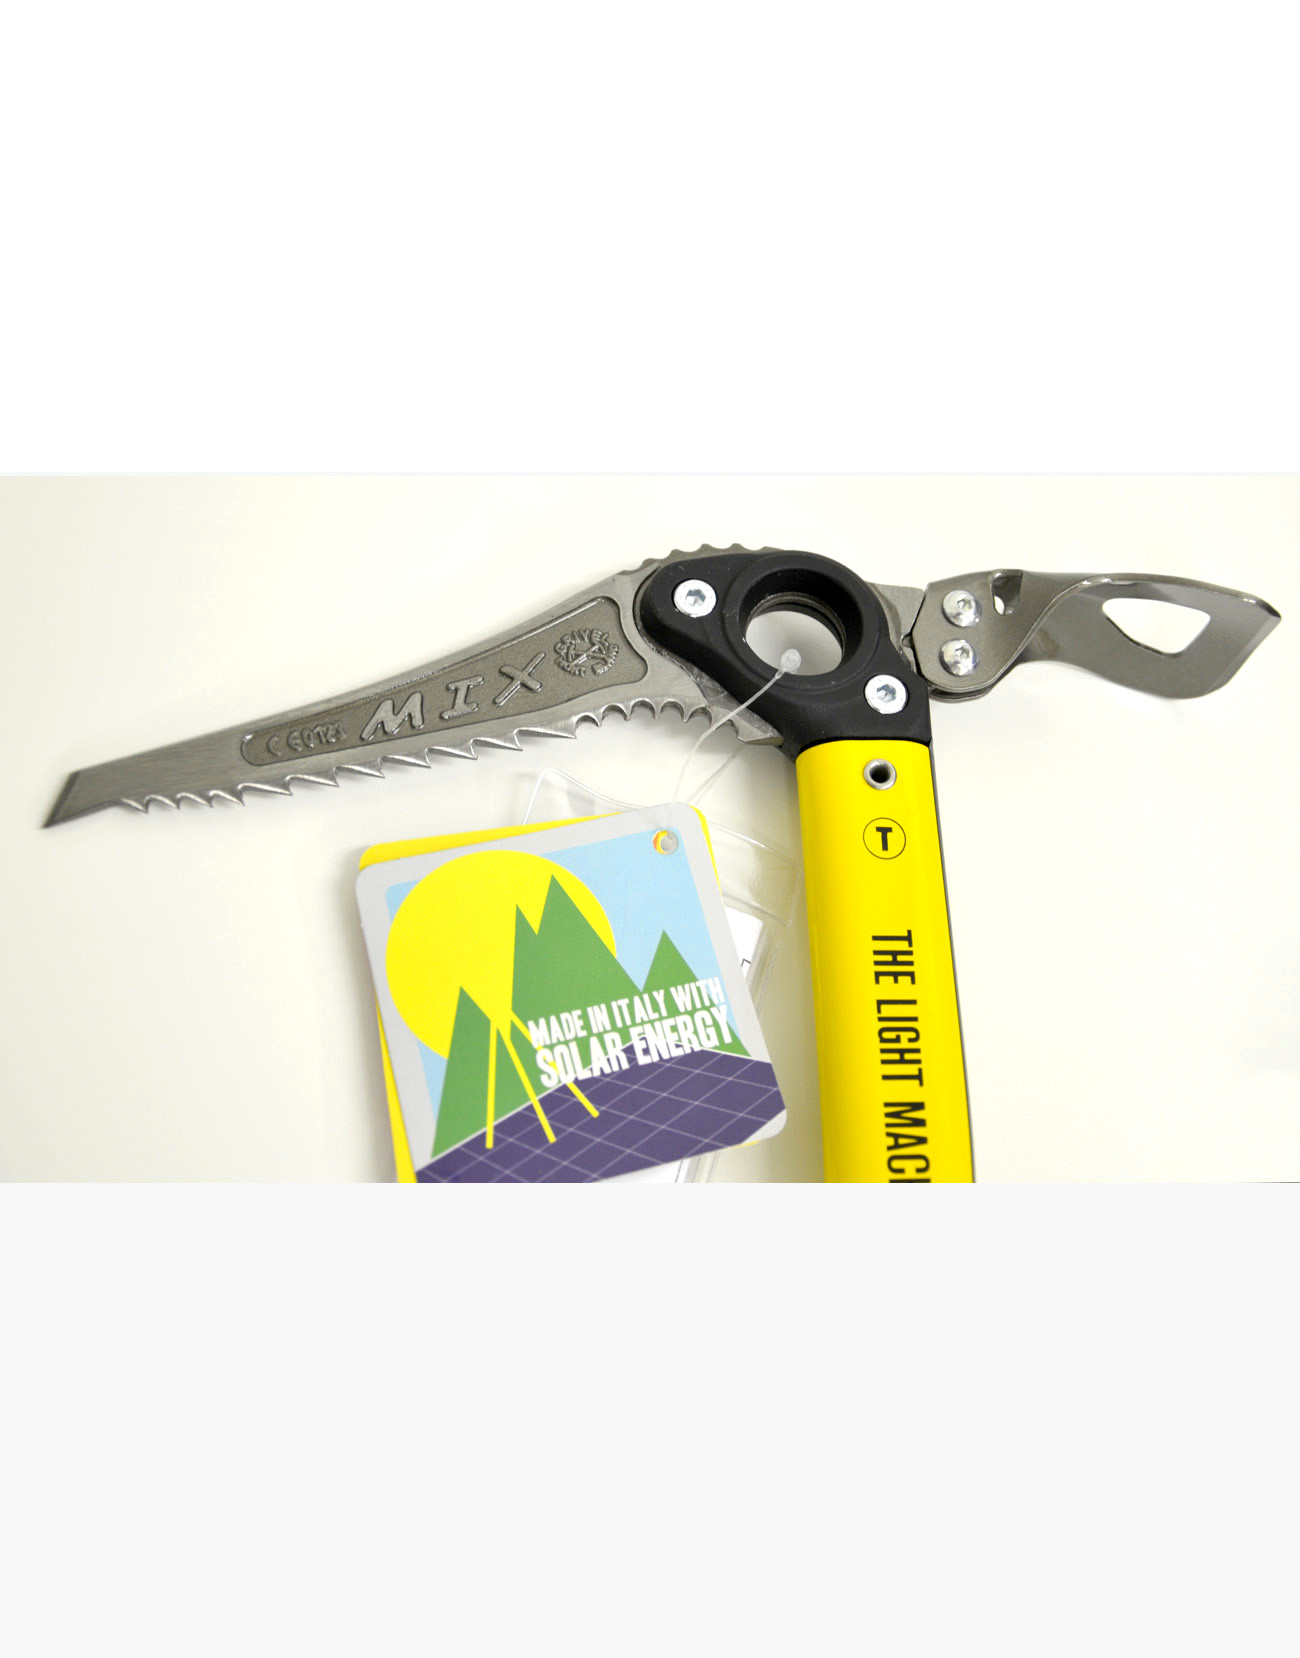 Grivel Light Machine Ice Tool | Backcountry.com